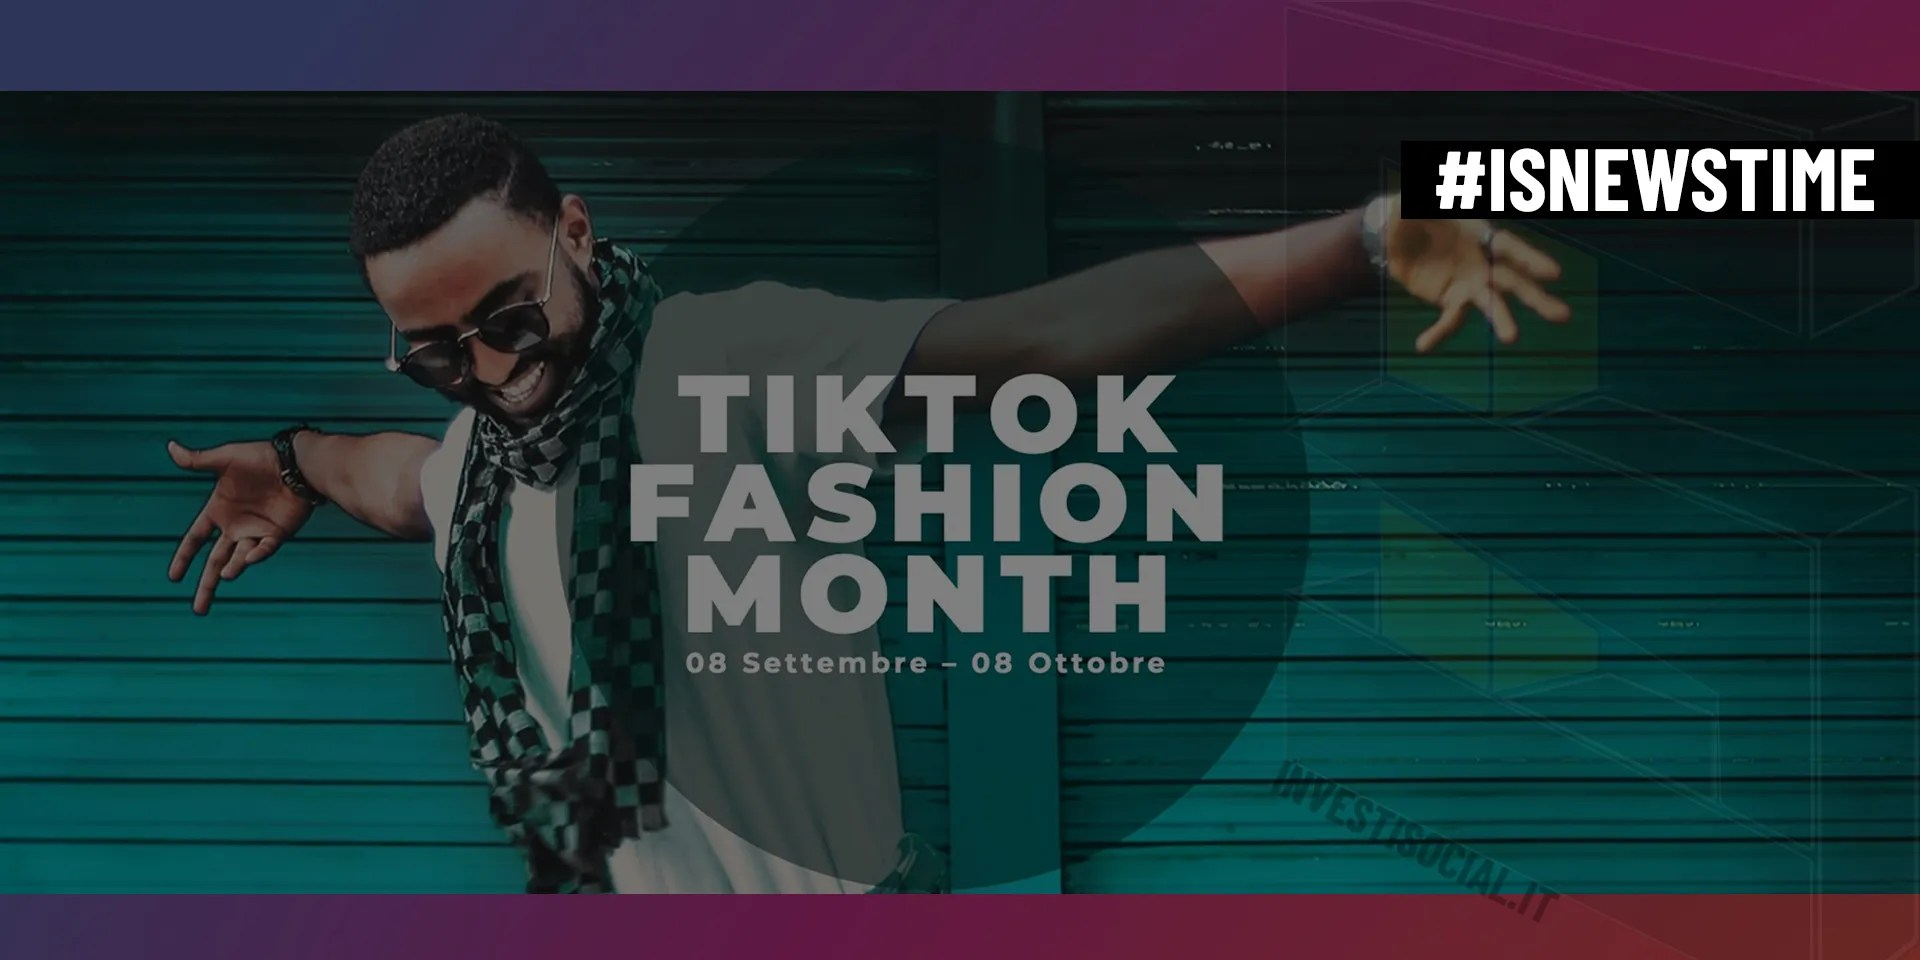 TikTok-annuncia-il-mese-della-moda-tiktokfashionmonth